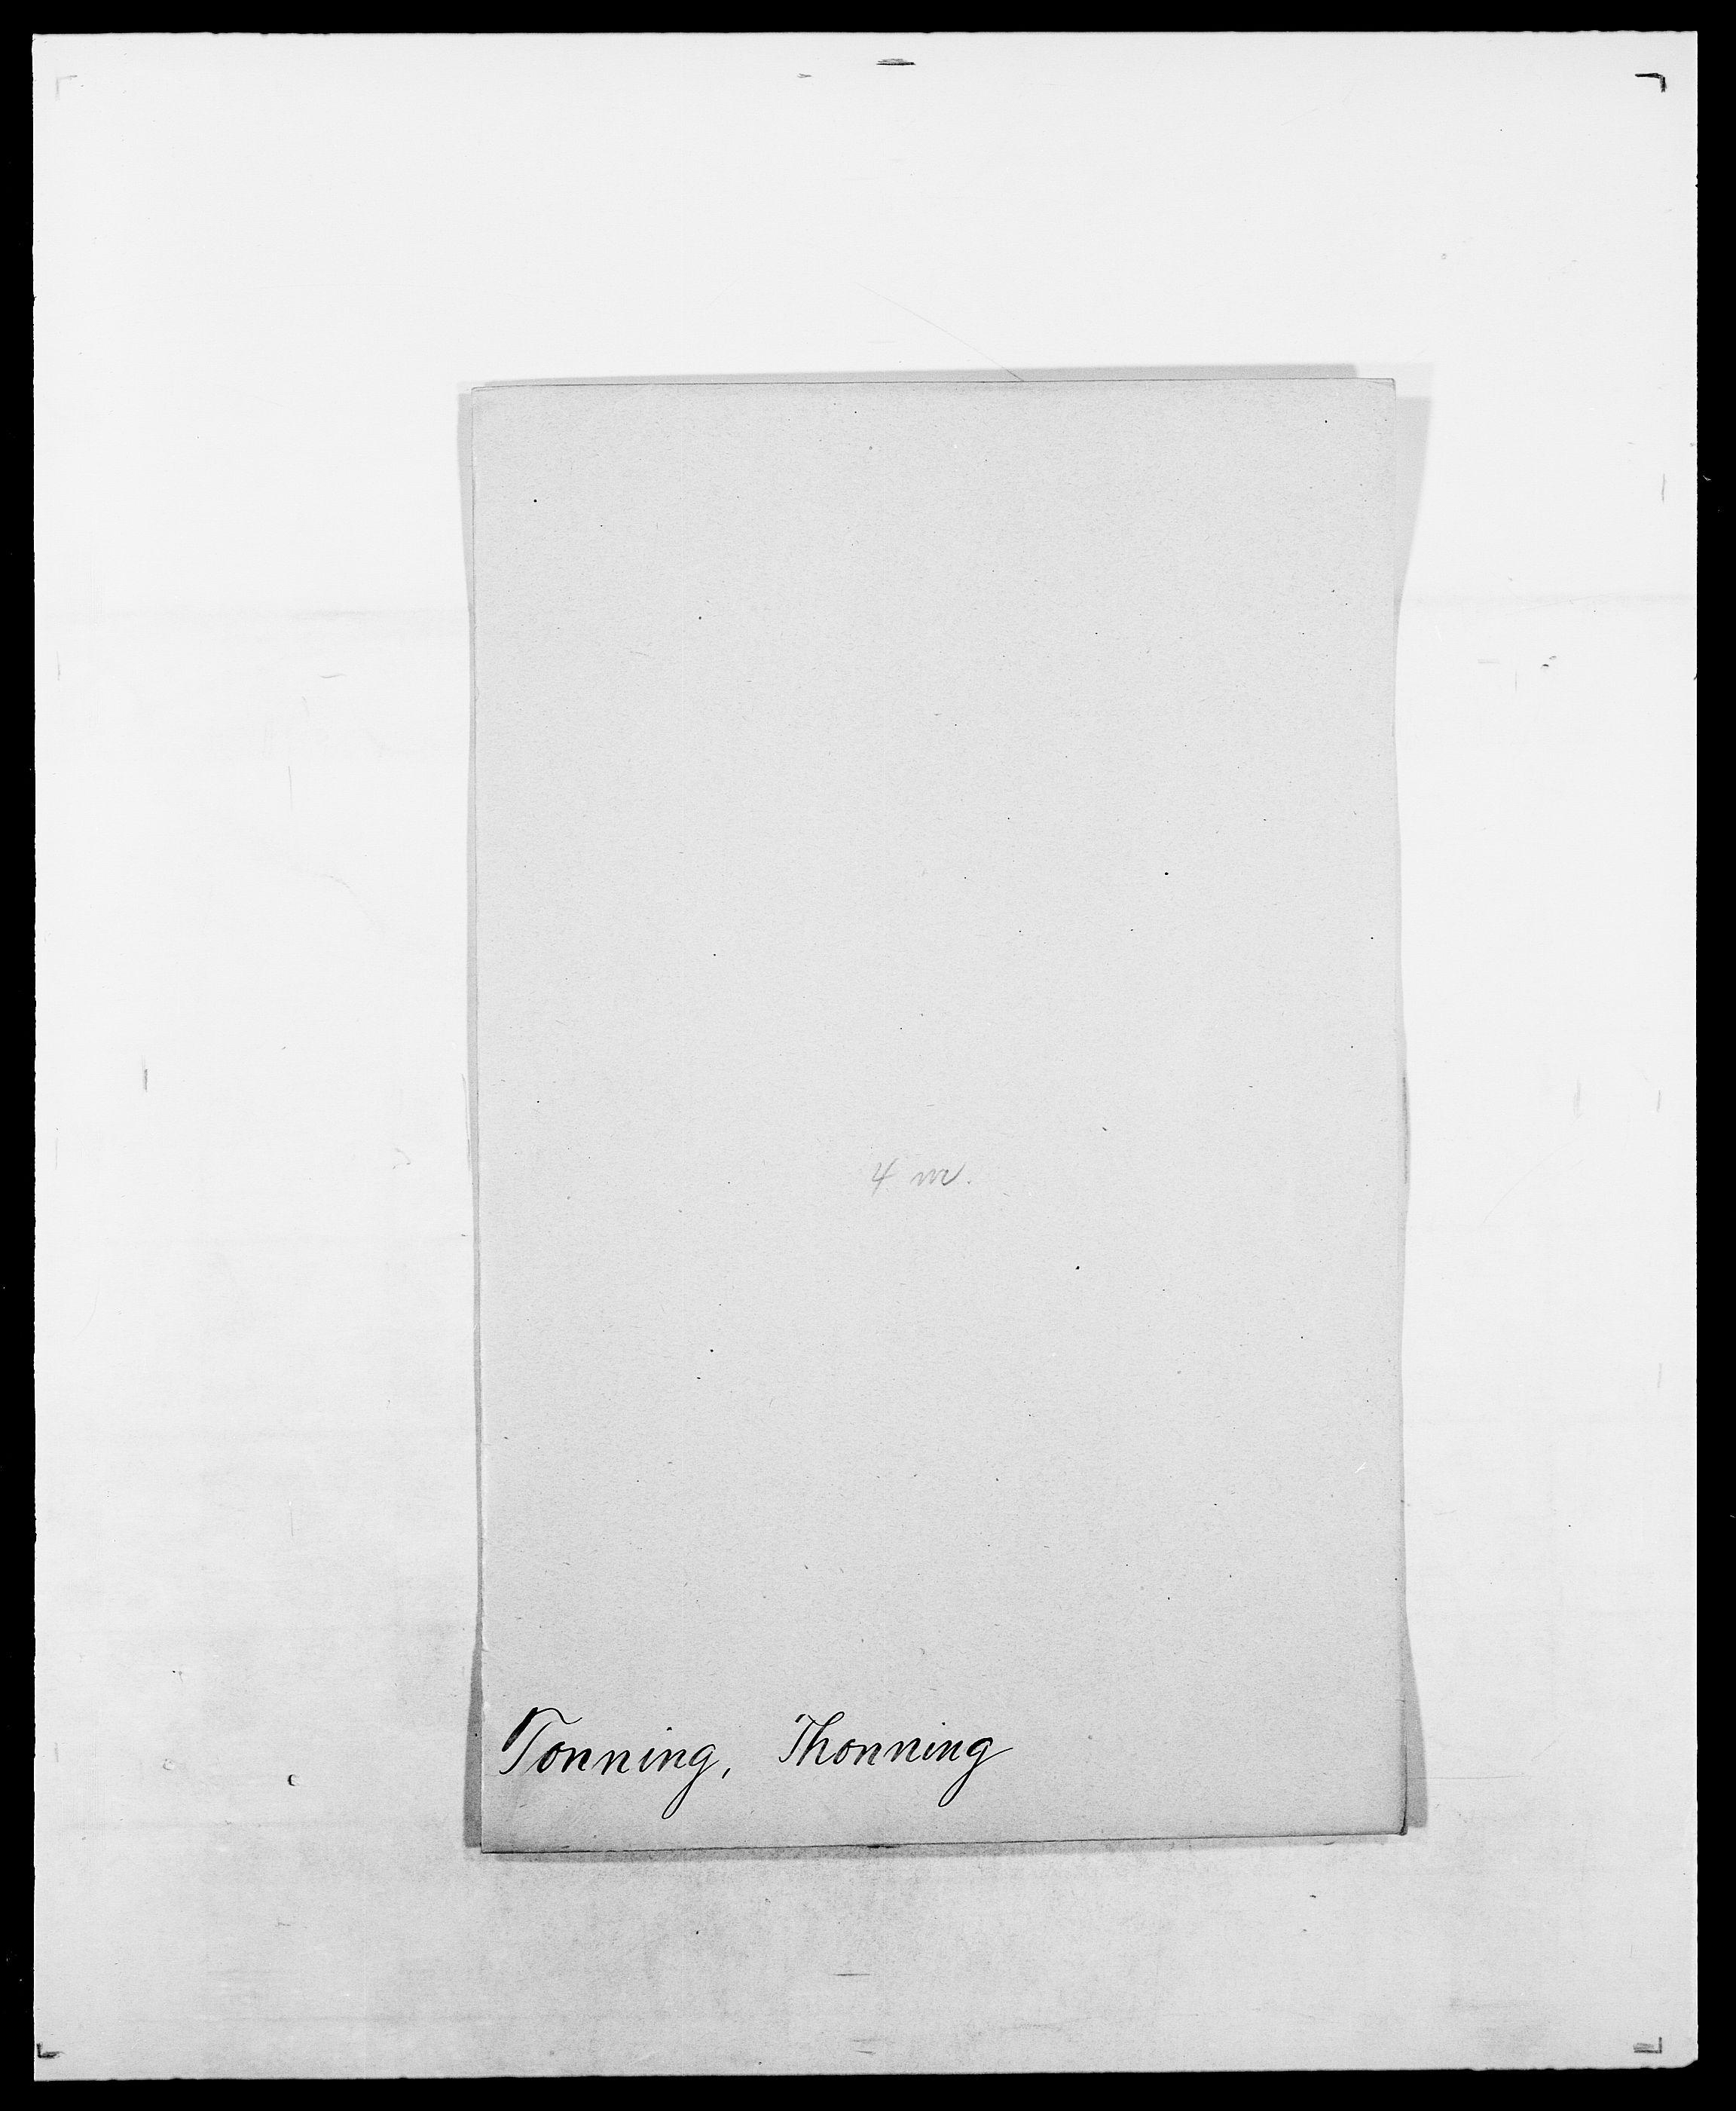 SAO, Delgobe, Charles Antoine - samling, D/Da/L0039: Thorsen - Urup, s. 137